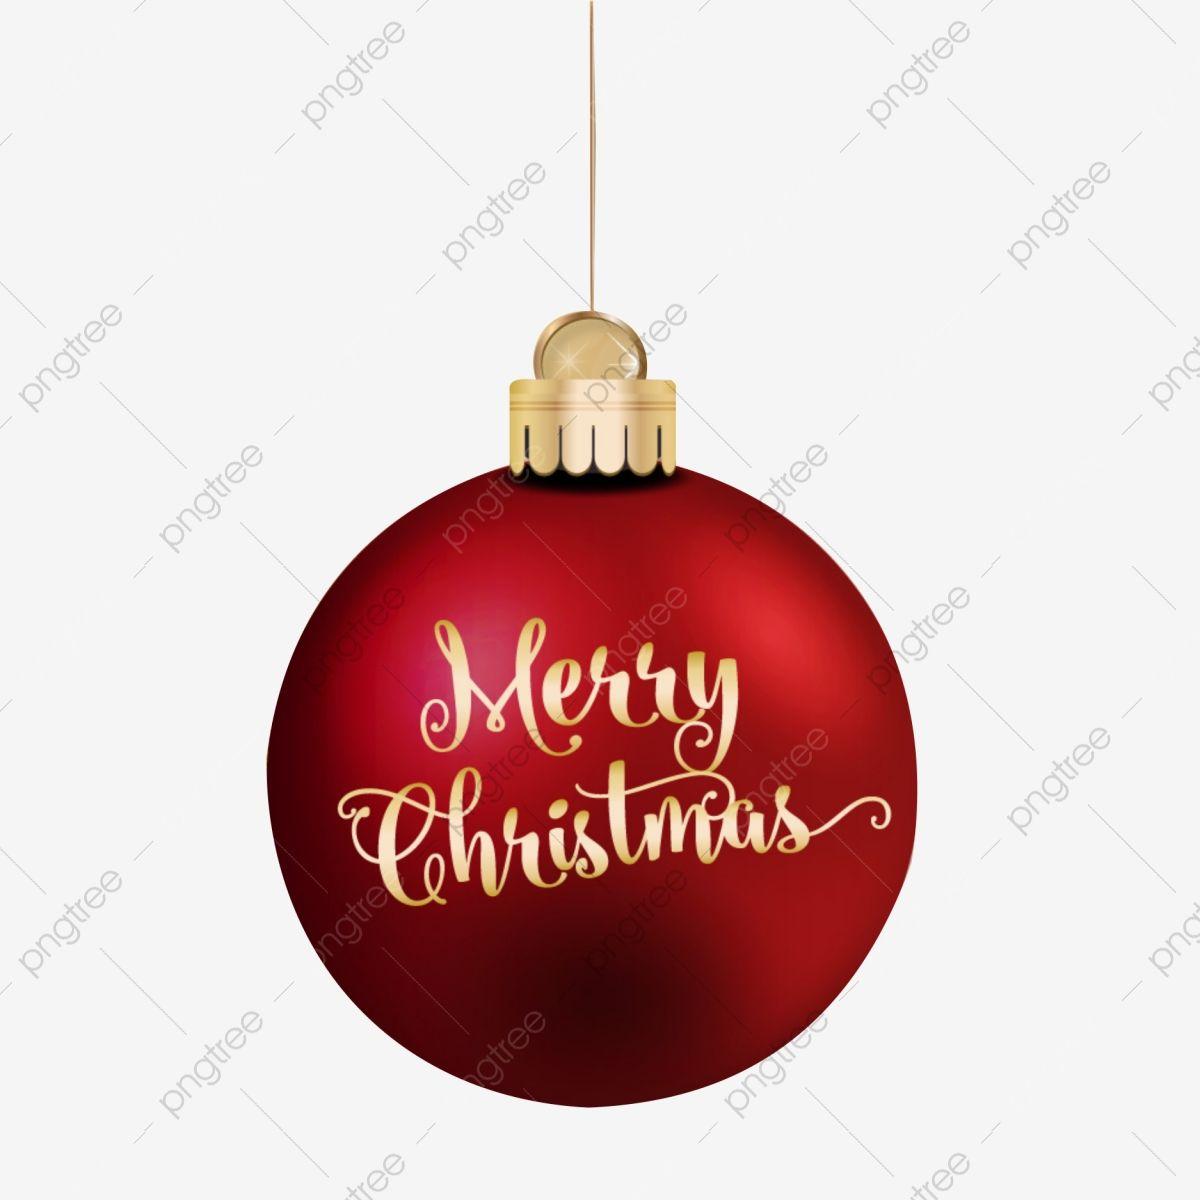 Bolas De Navidad Bolas De Navidad Feliz Navidad 2019 Png Y Psd Para Descargar Gratis Pngtree Christmas Balls Realistic Christmas Trees Christmas